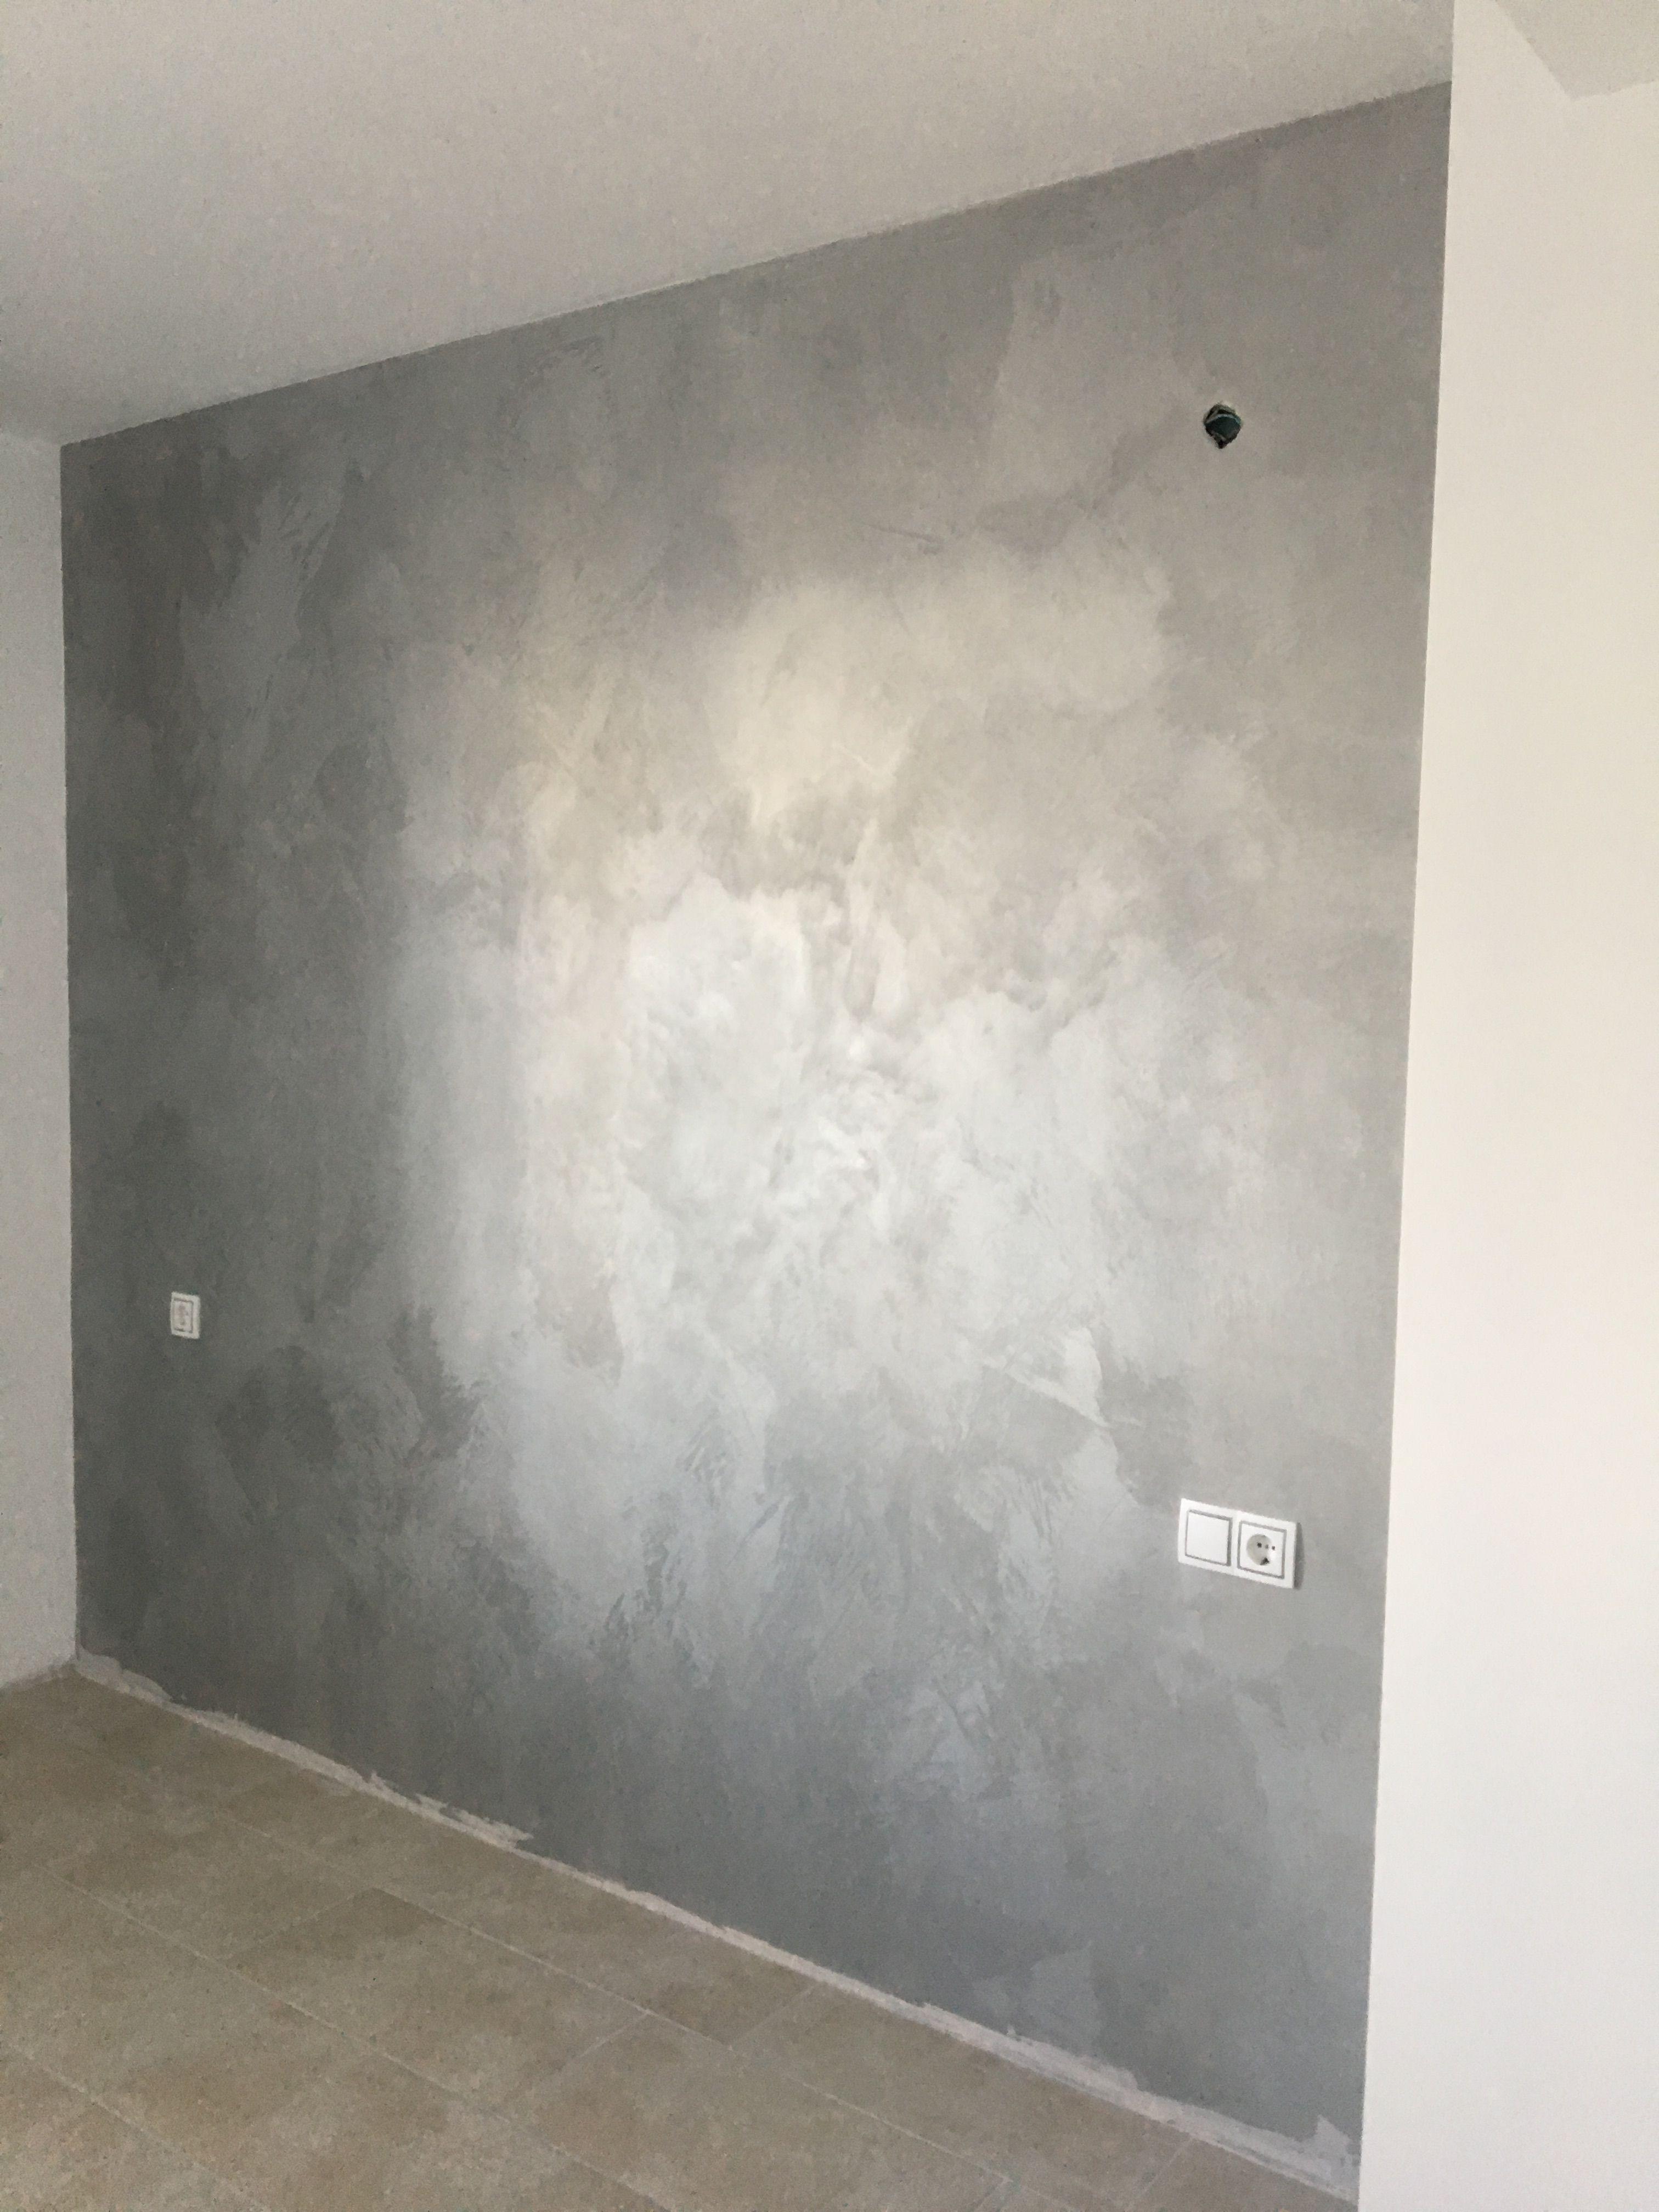 Efecto seda osaka damasco gris pinturas decorativas en - Pintura decorativa para paredes ...